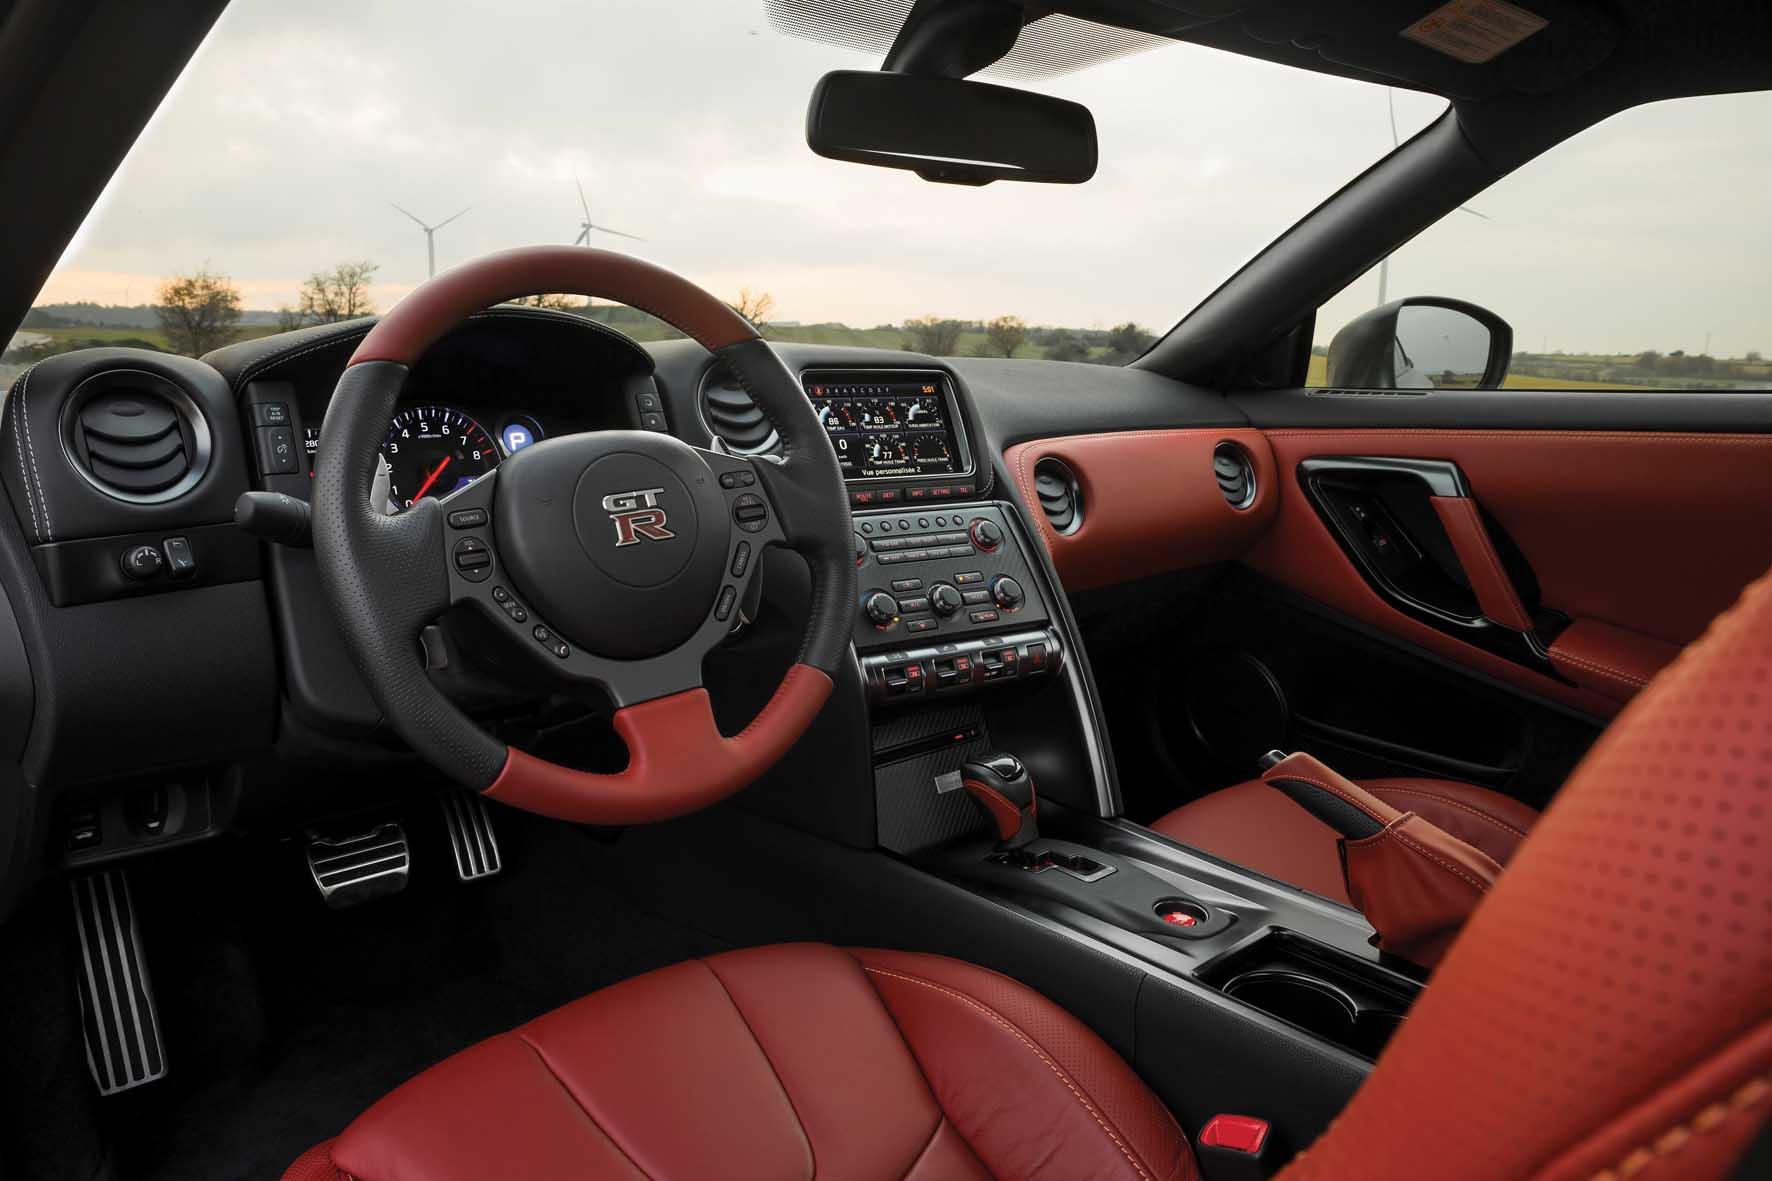 Nissan 2013 GT-R interni 1